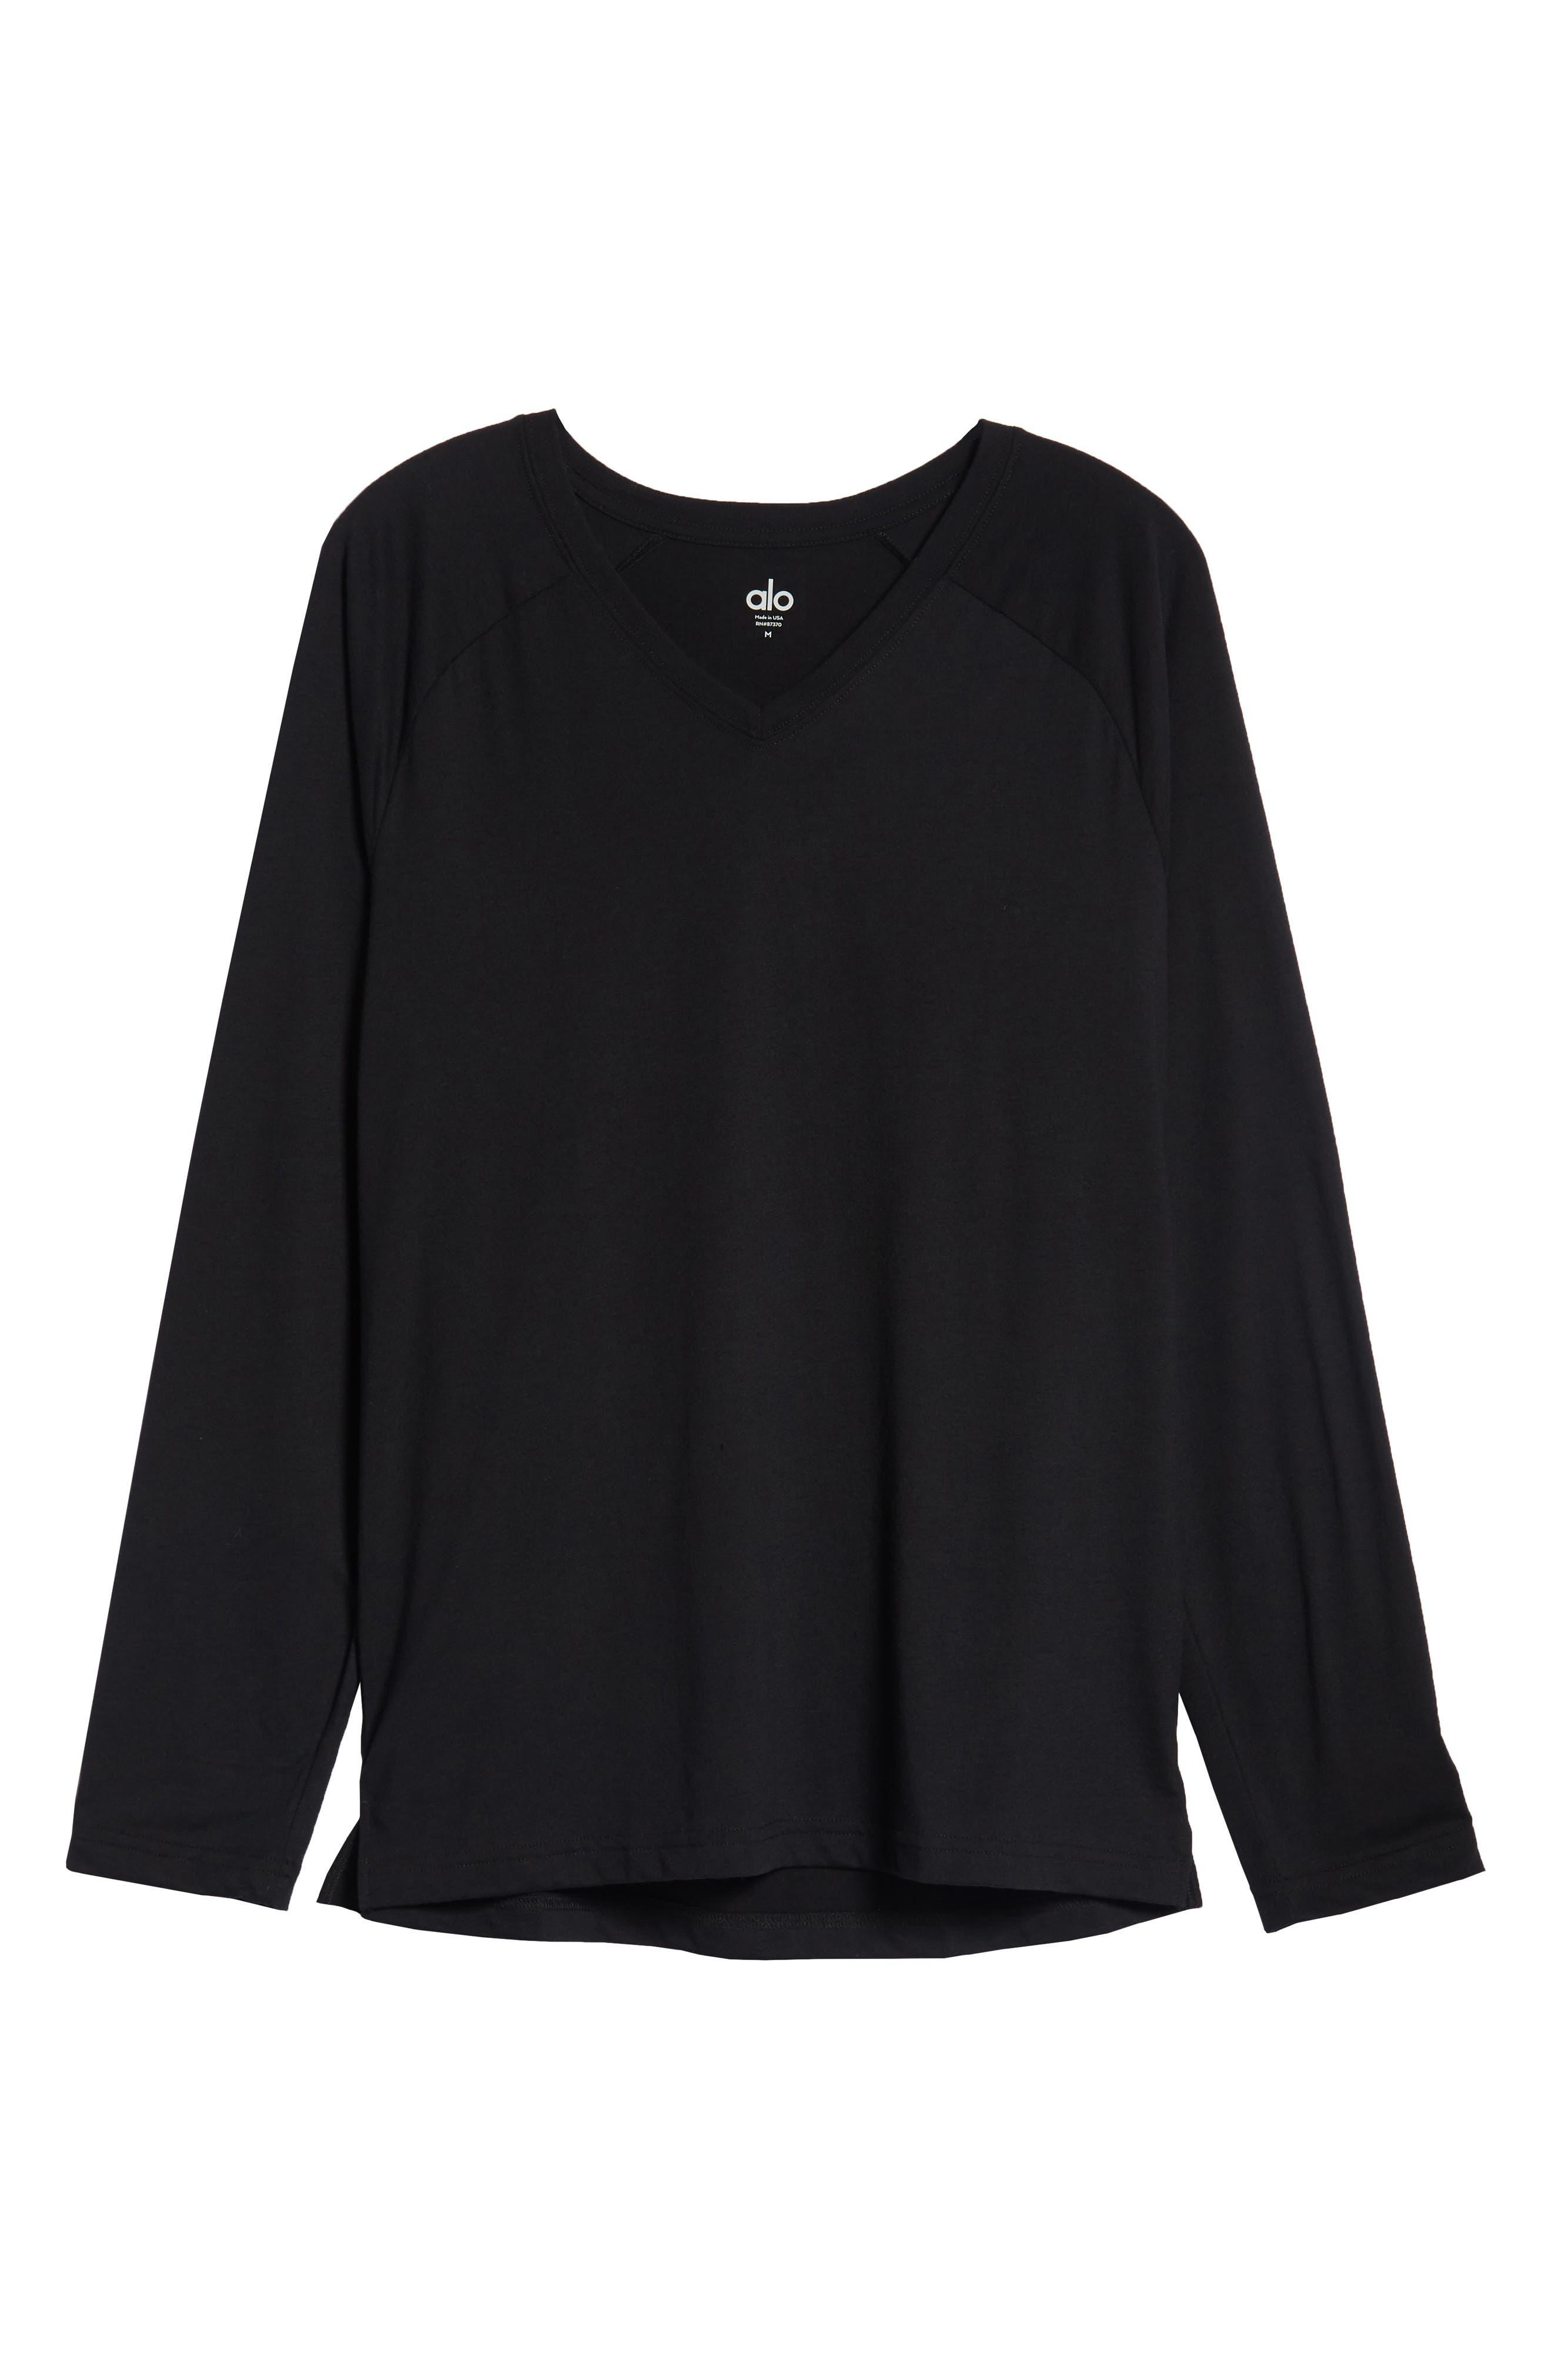 ALO, Triumph Long Raglan Sleeve V-Neck T-Shirt, Alternate thumbnail 6, color, SOLID BLACK TRIBLEND